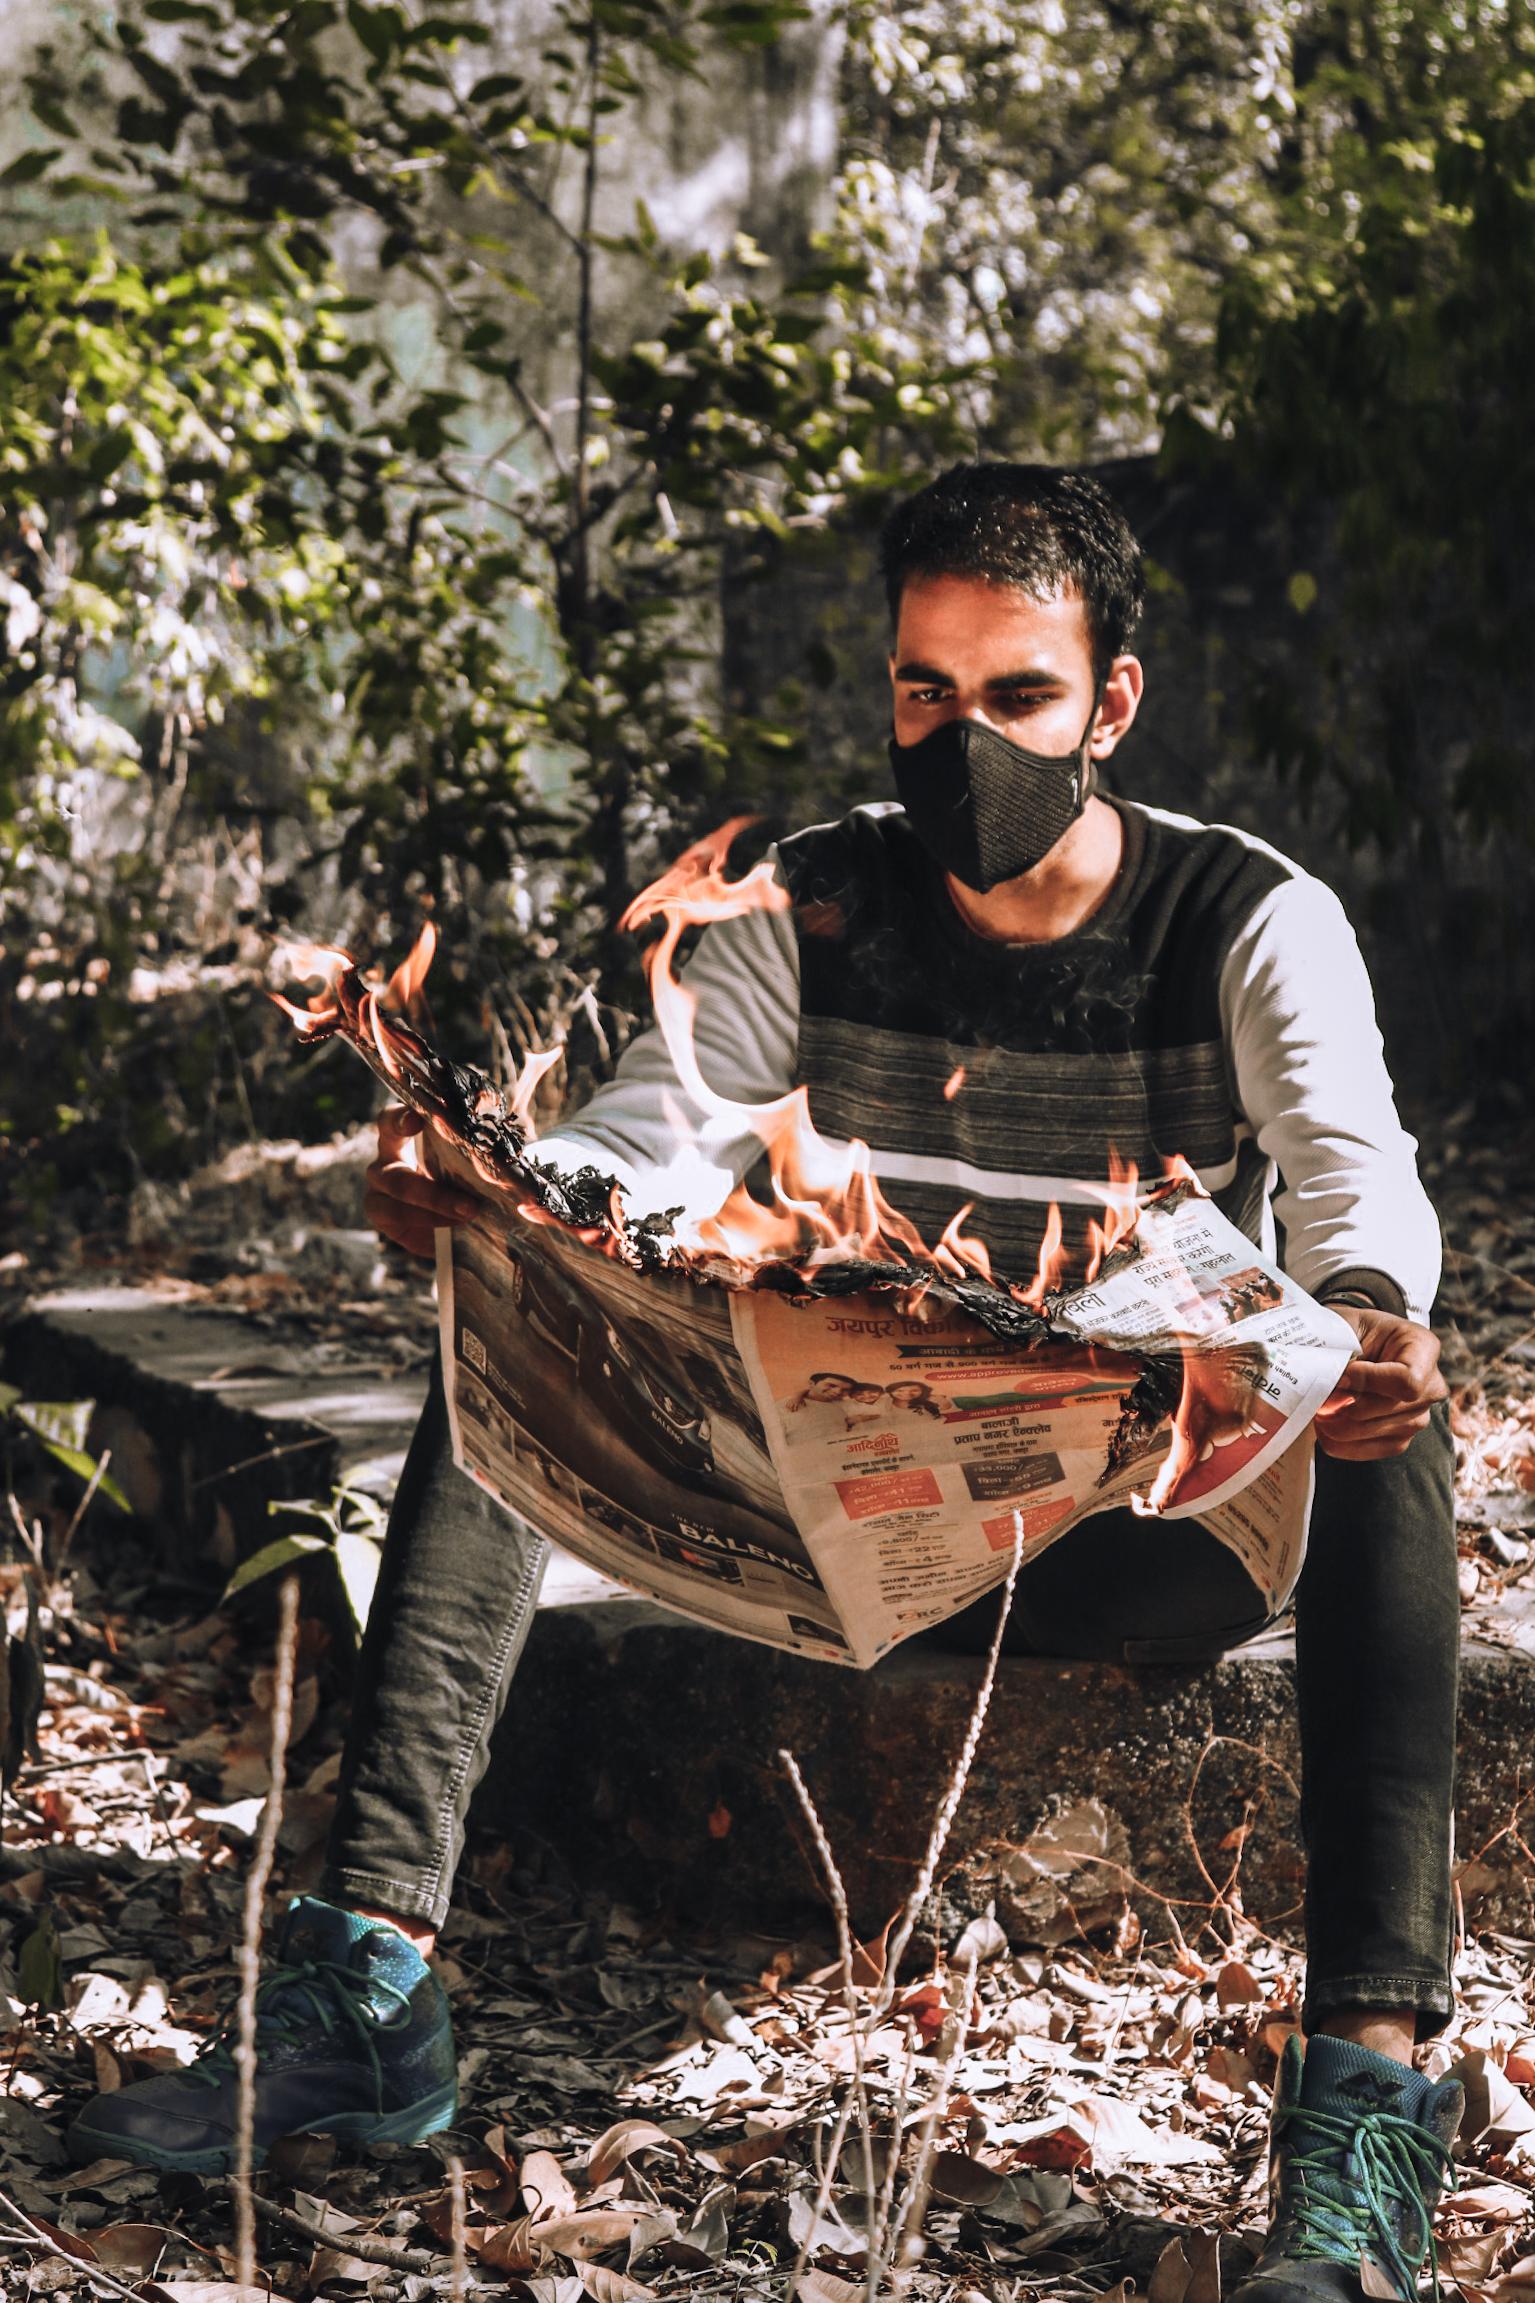 Boy holding burning newspaper